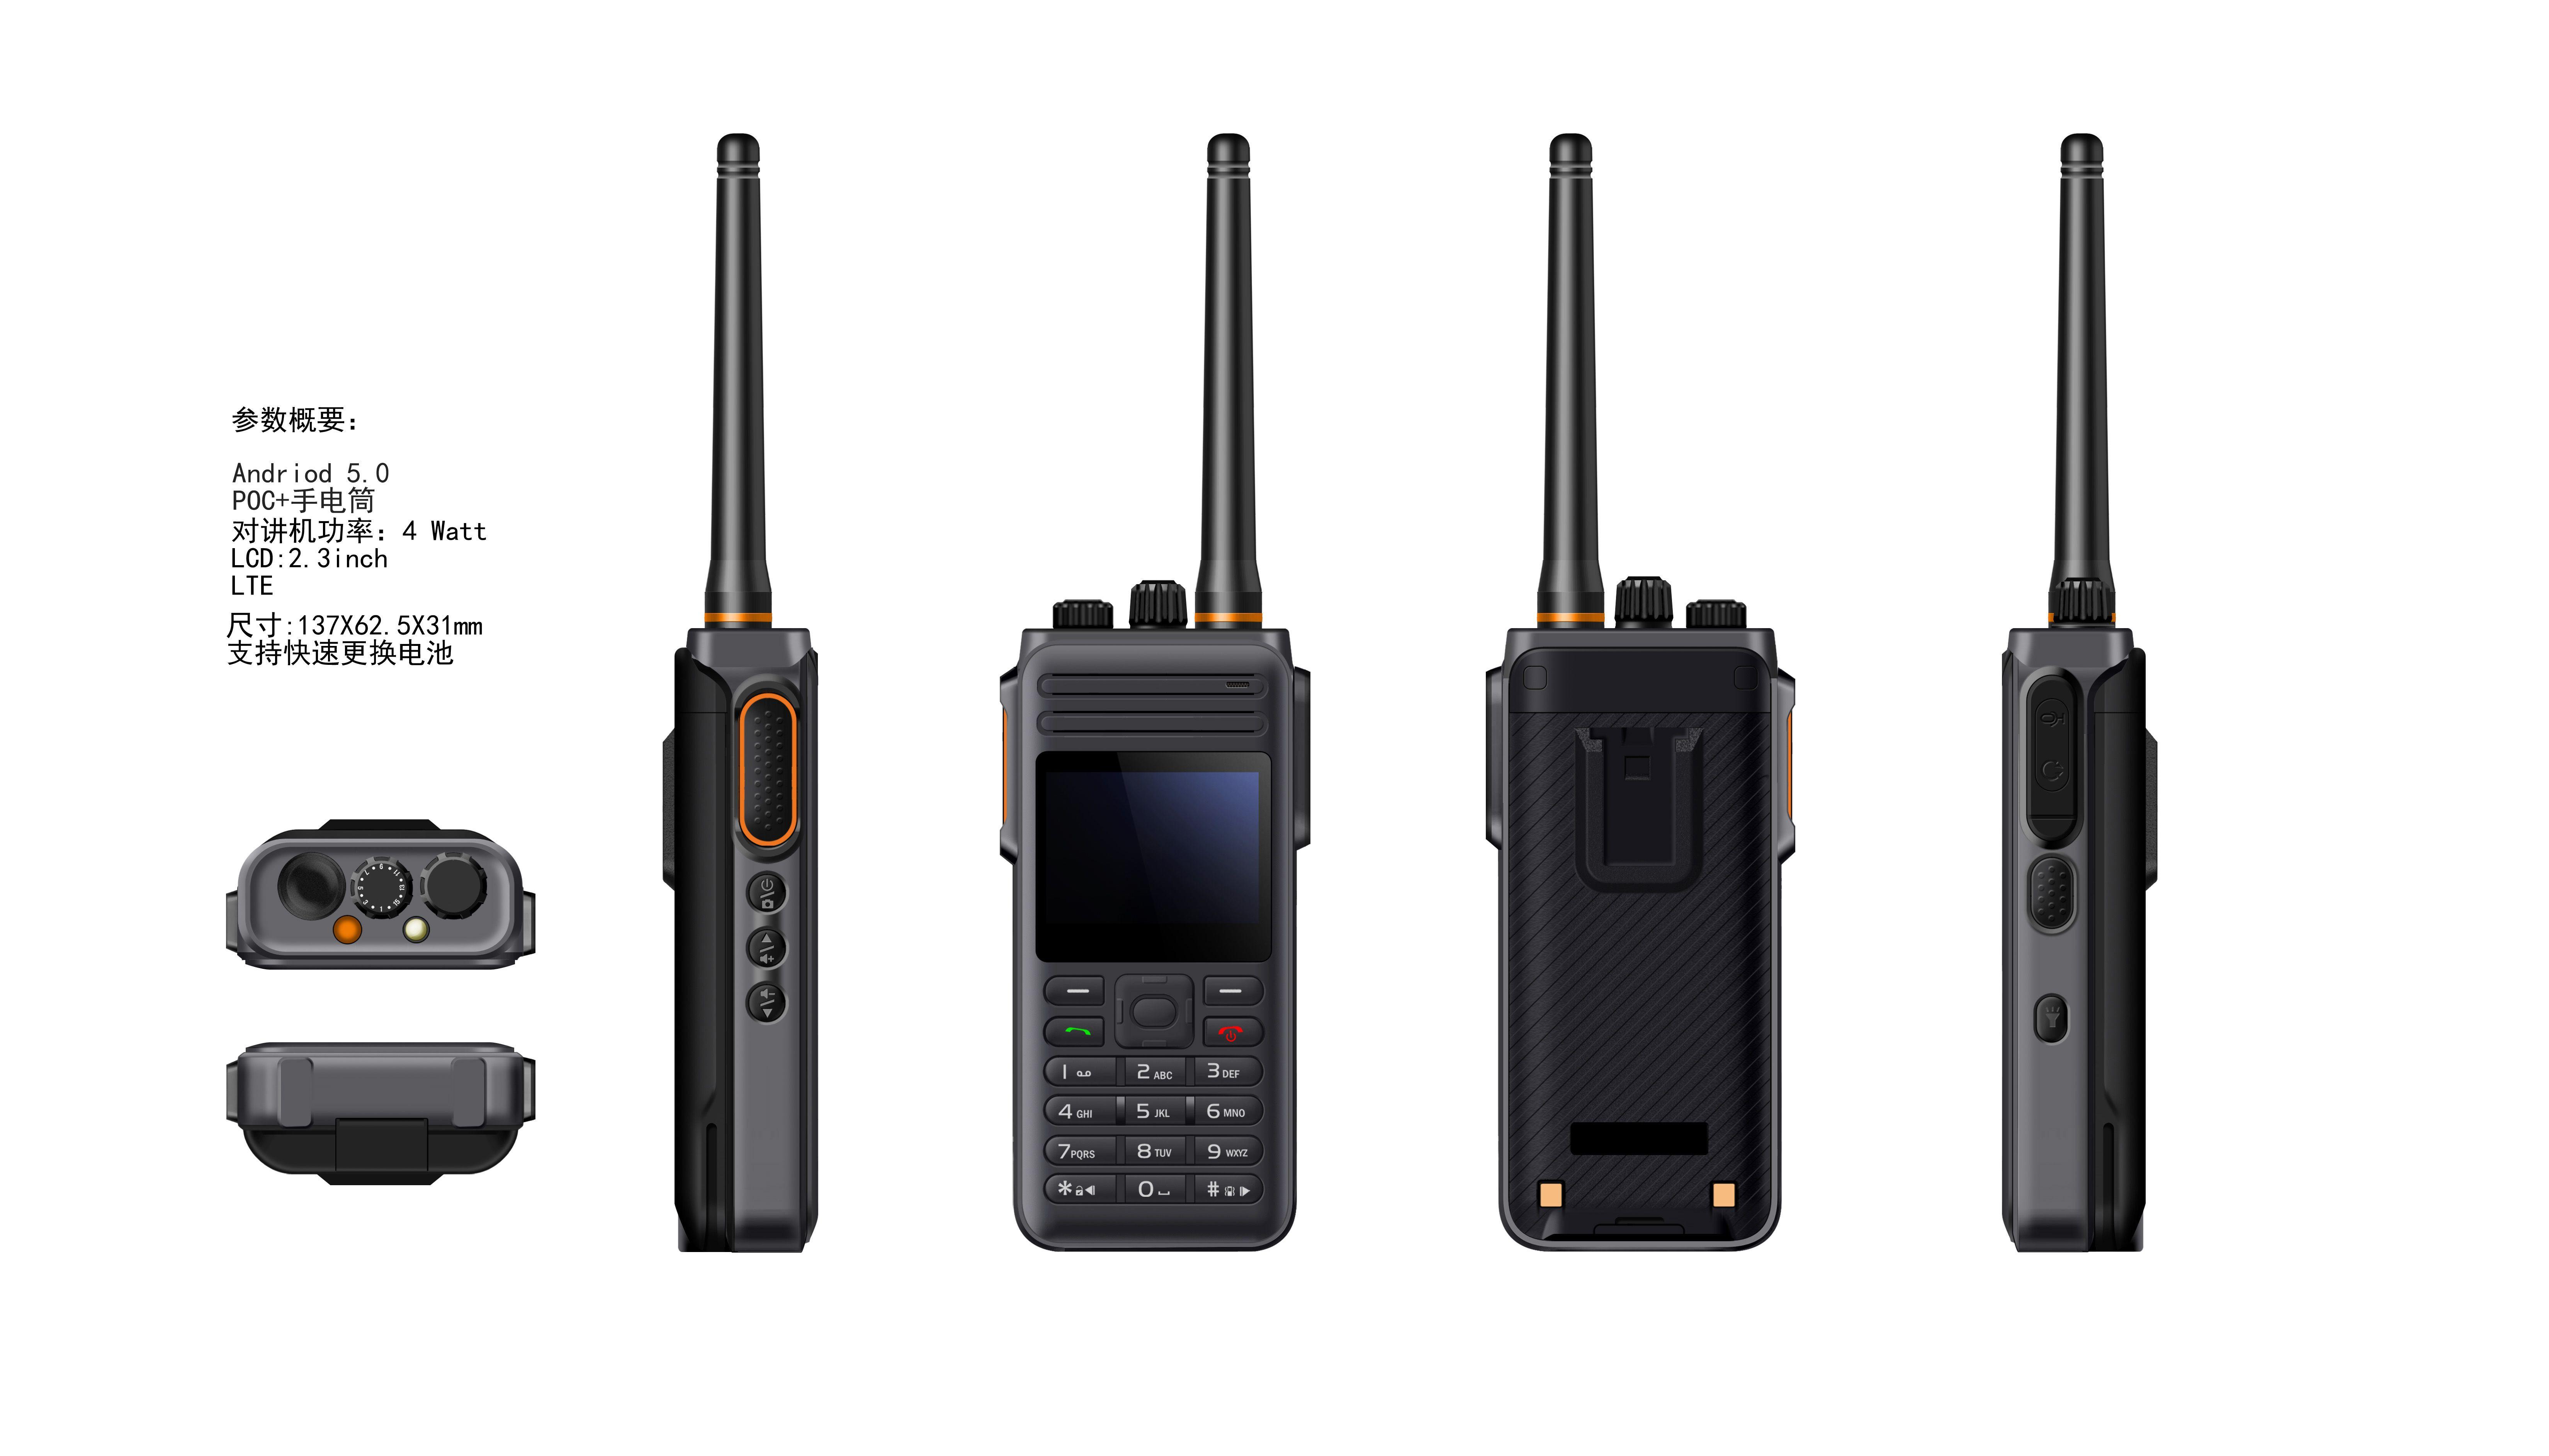 RADIO DMR ANALOG POC PUSH TO TALK VIA CELLULAR poc radio